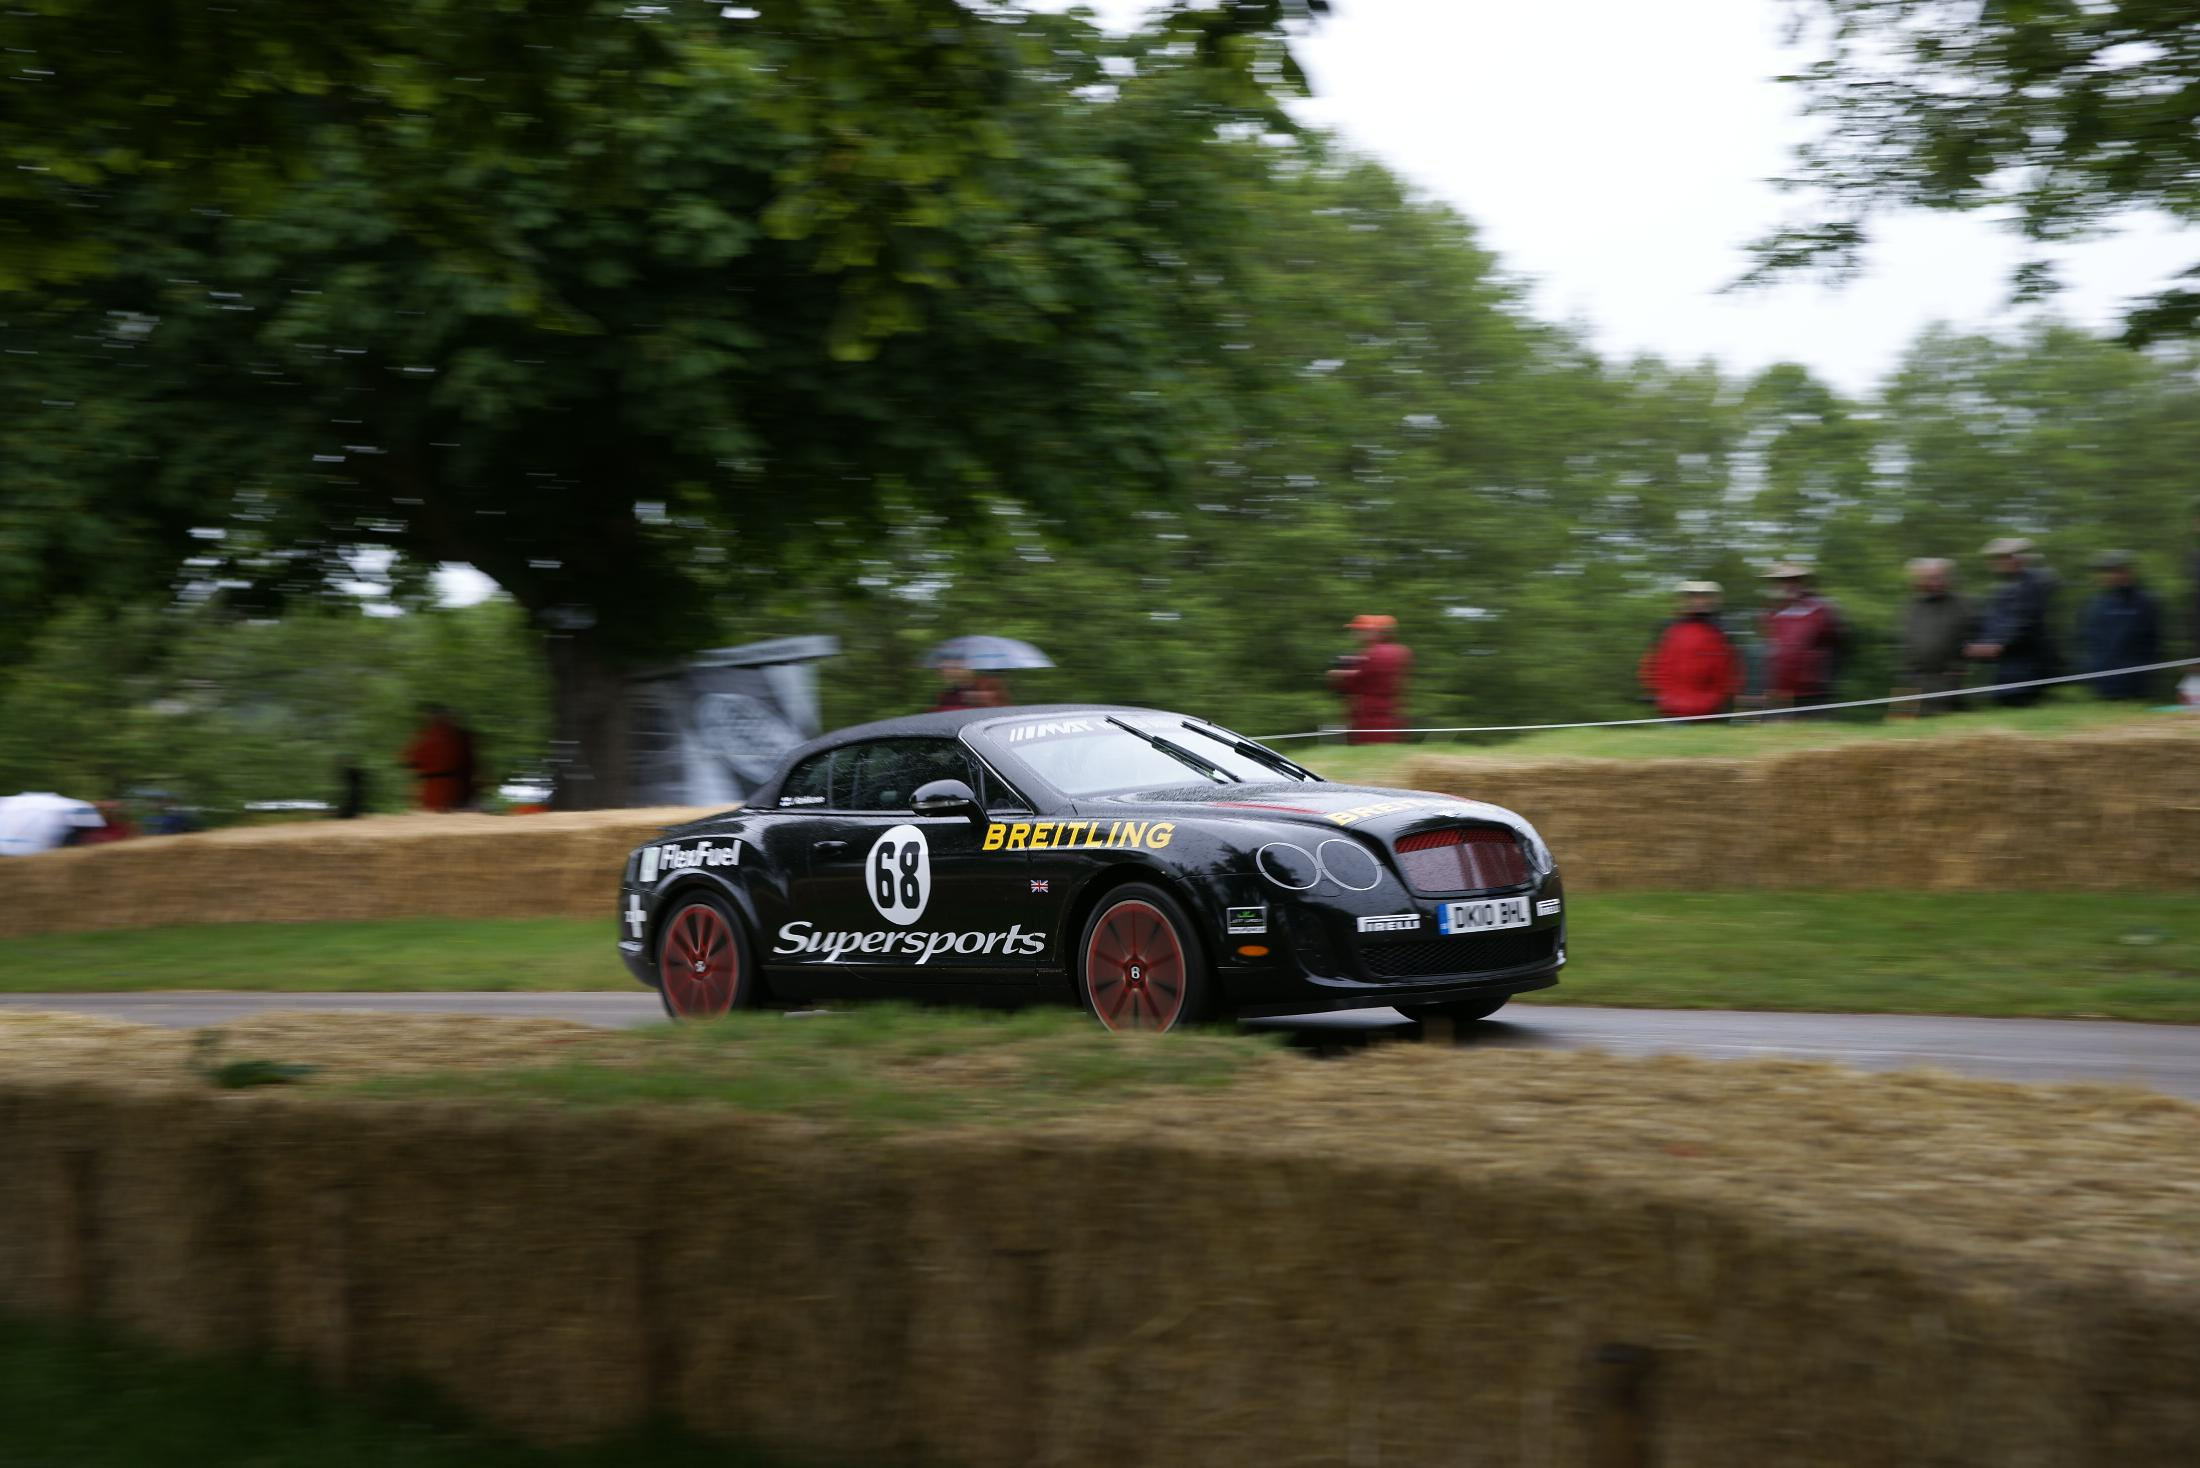 Bentley GTC Supersport Cholmondeley 2012